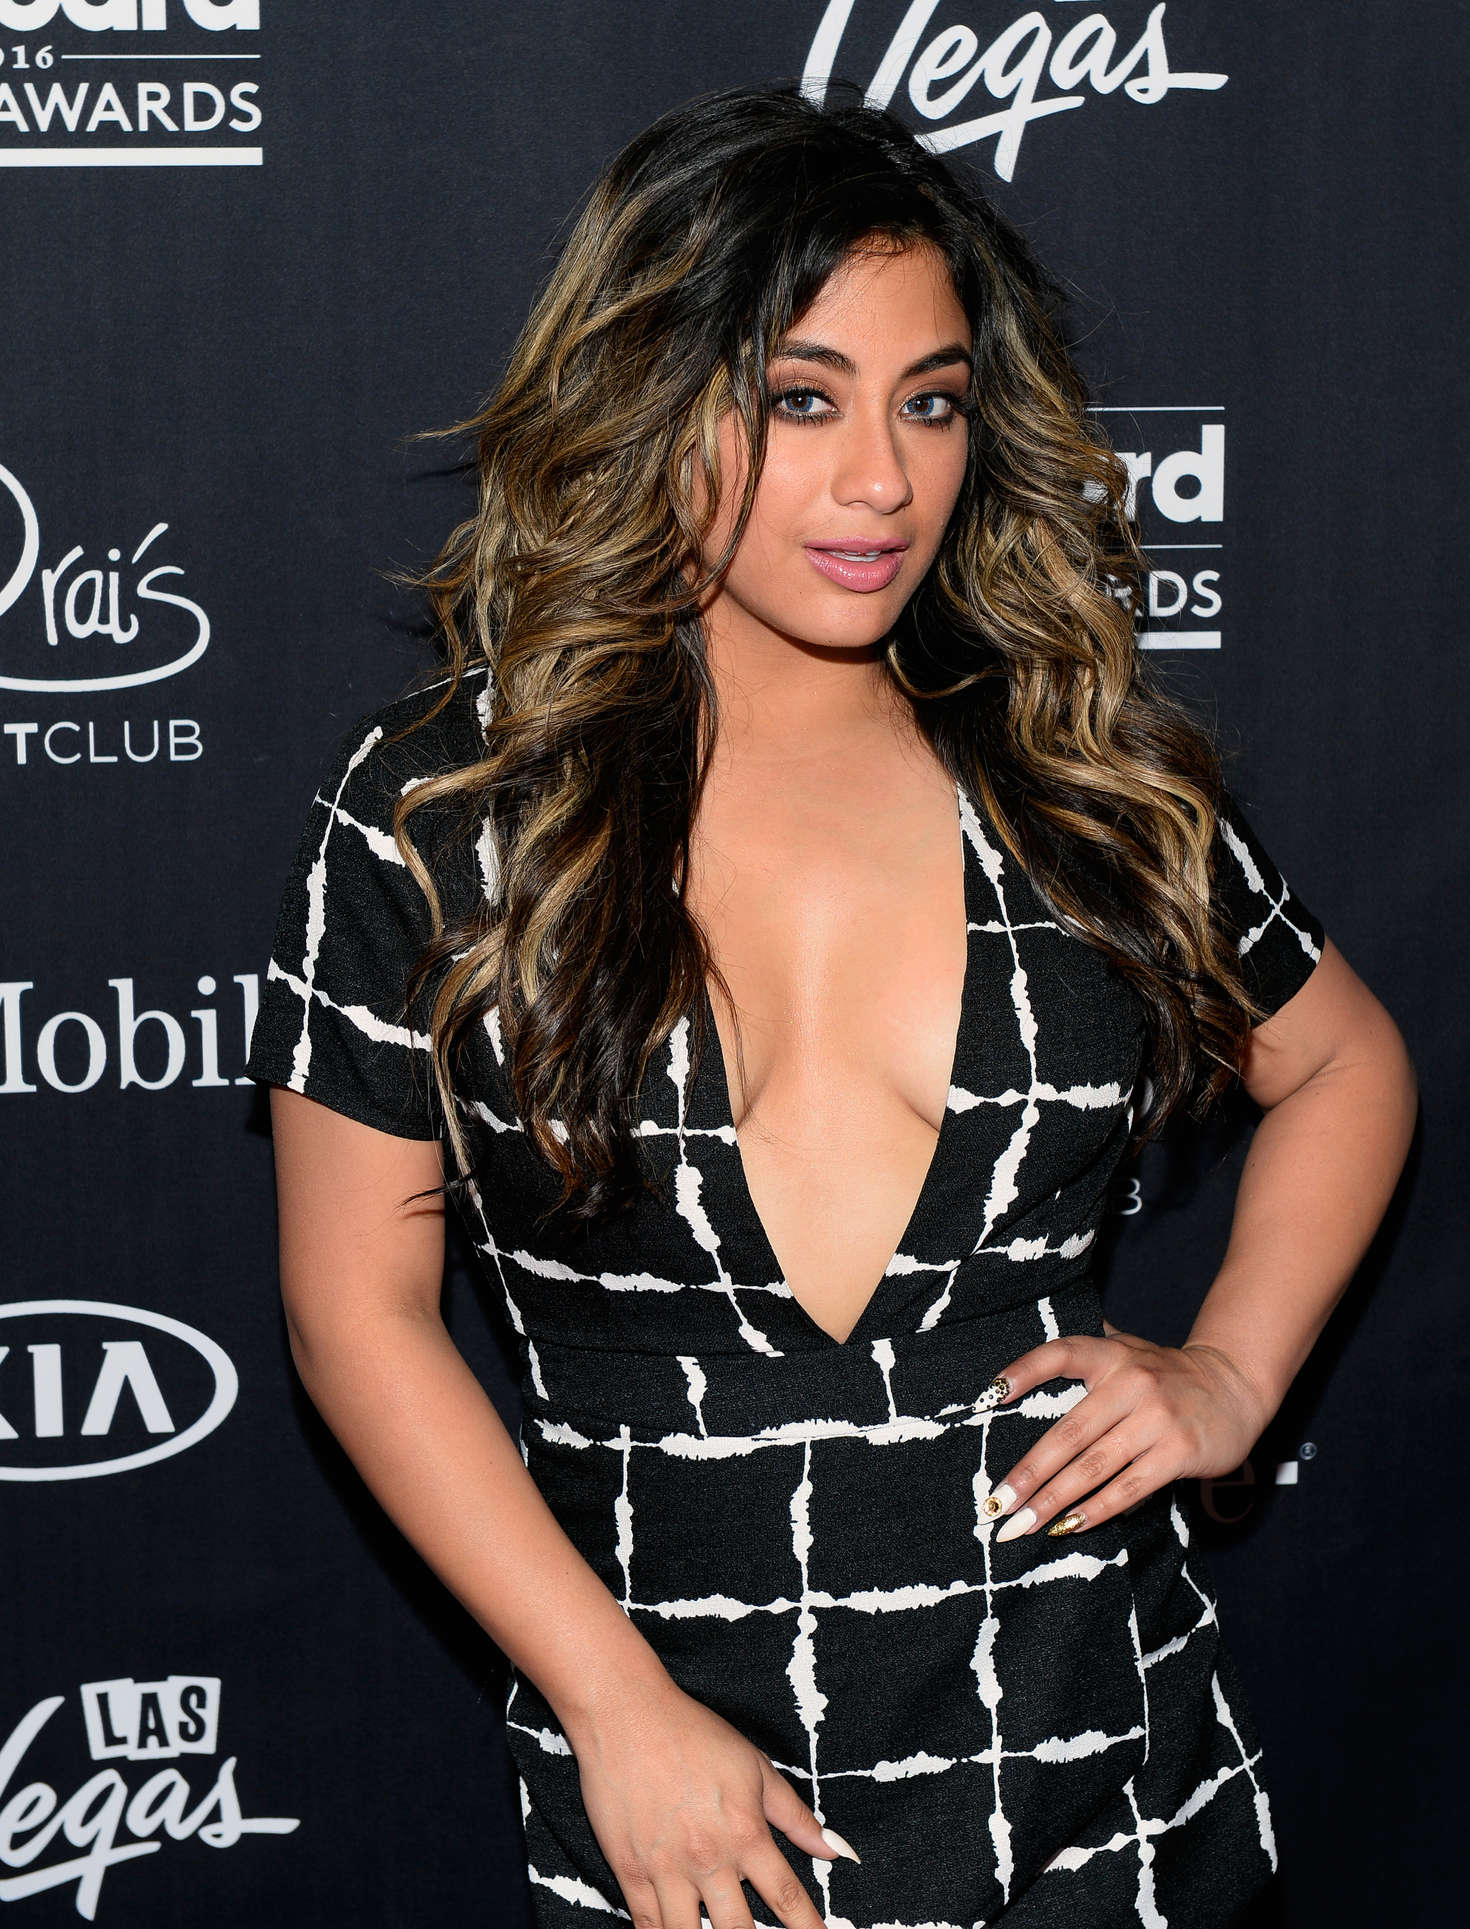 Ally Brooke Hernandez - Billboard Music Awards After Party 2016 in Las Vegas